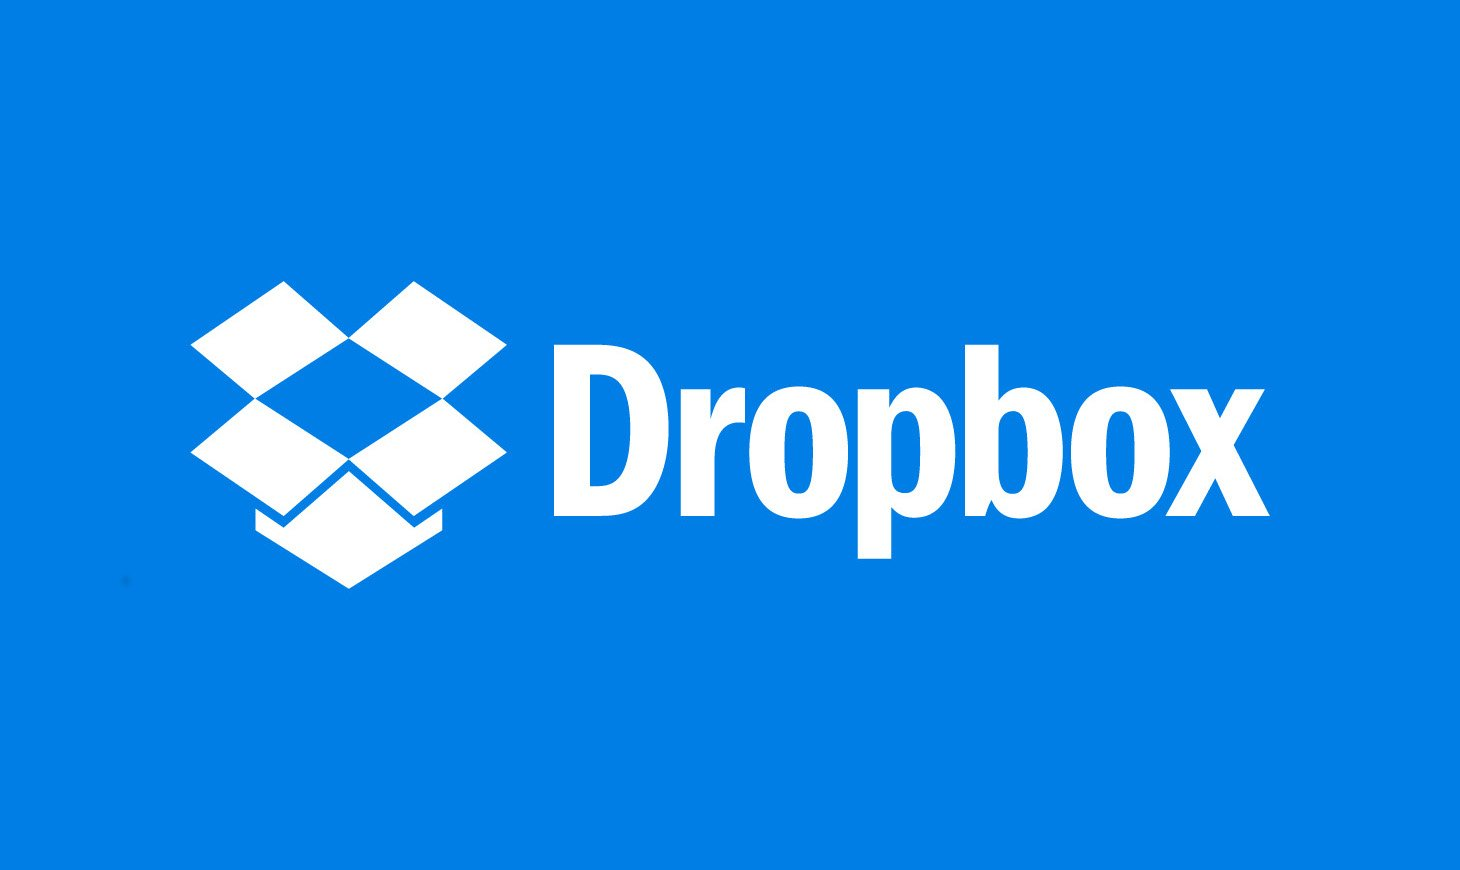 Startup - dropbox